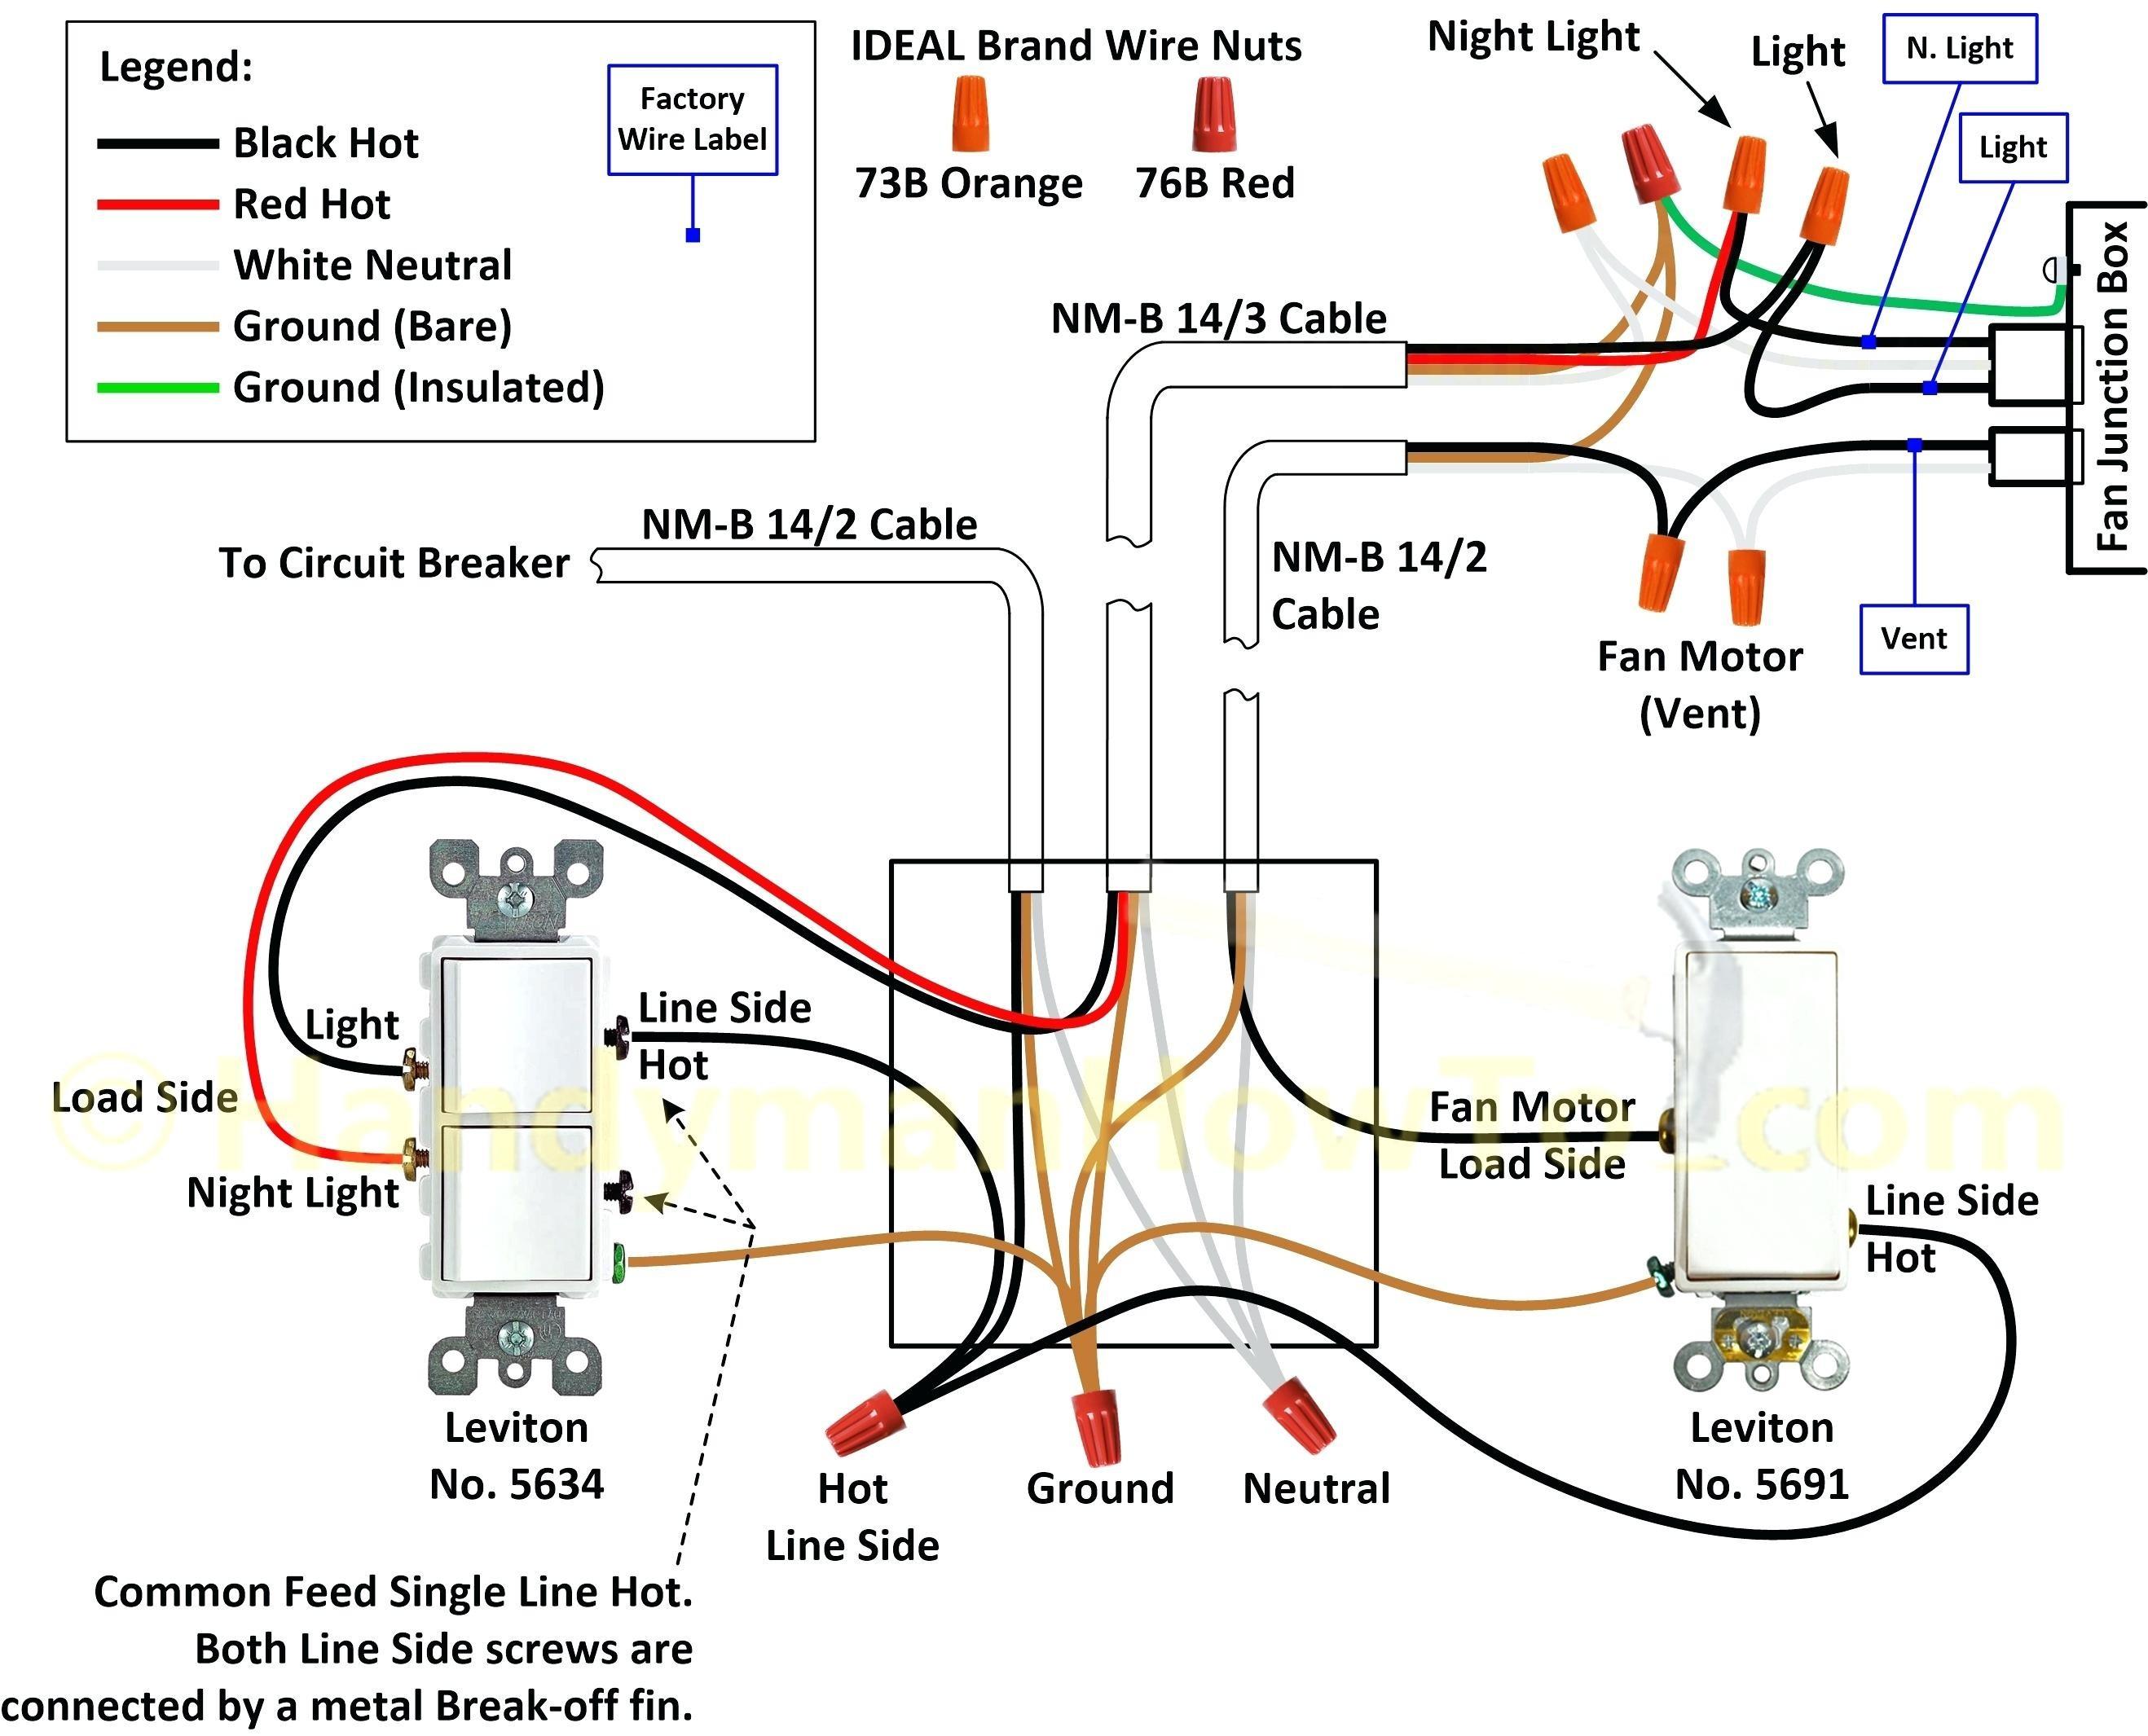 Road King Microphone Wiring Diagram | Wiring Liry Galaxy Echomaster Mic Wiring Diagram on